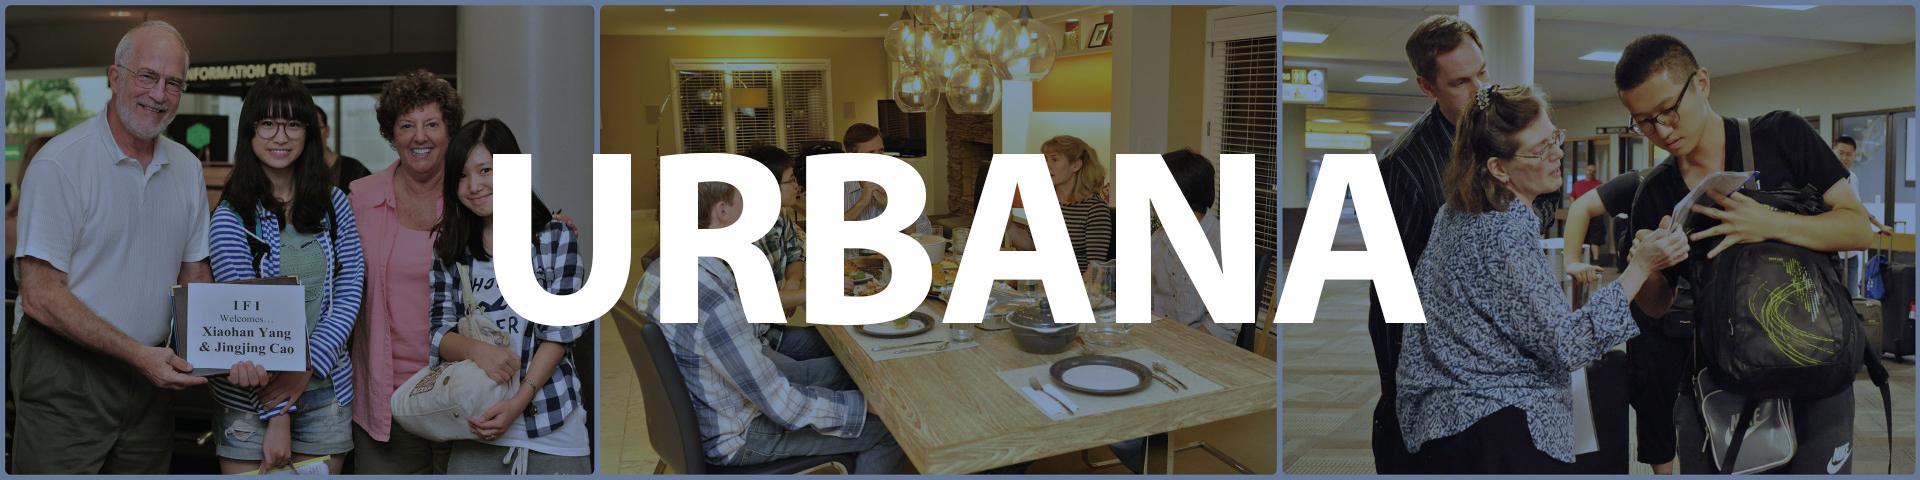 banner-image-1-urbana